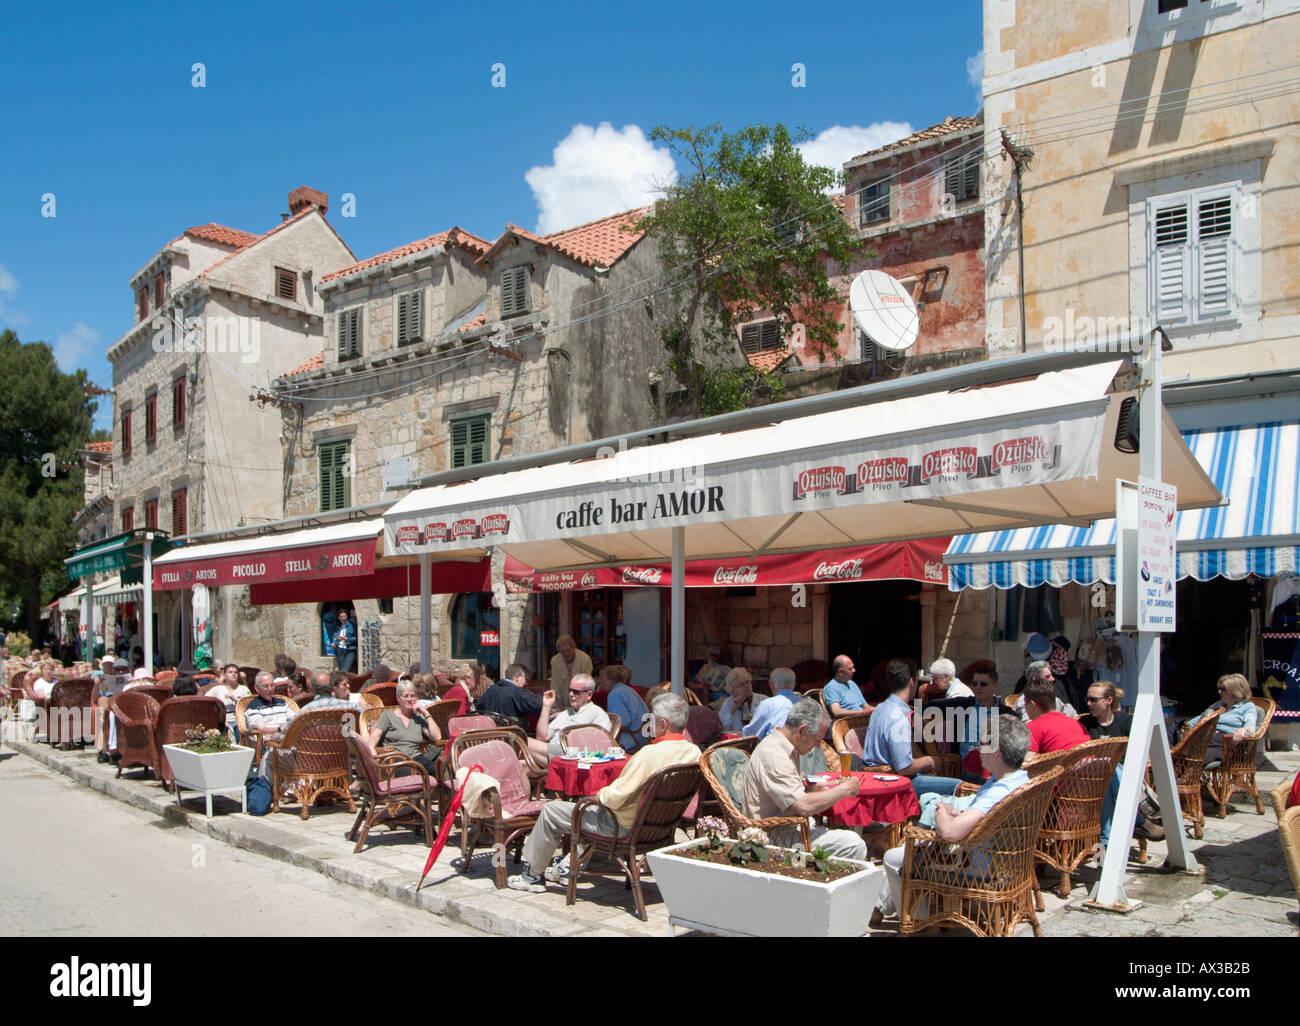 Seafront cafe  in Cavtat, Dubrovnik Riviera, Dalmatian Coast, Croatia - Stock Image